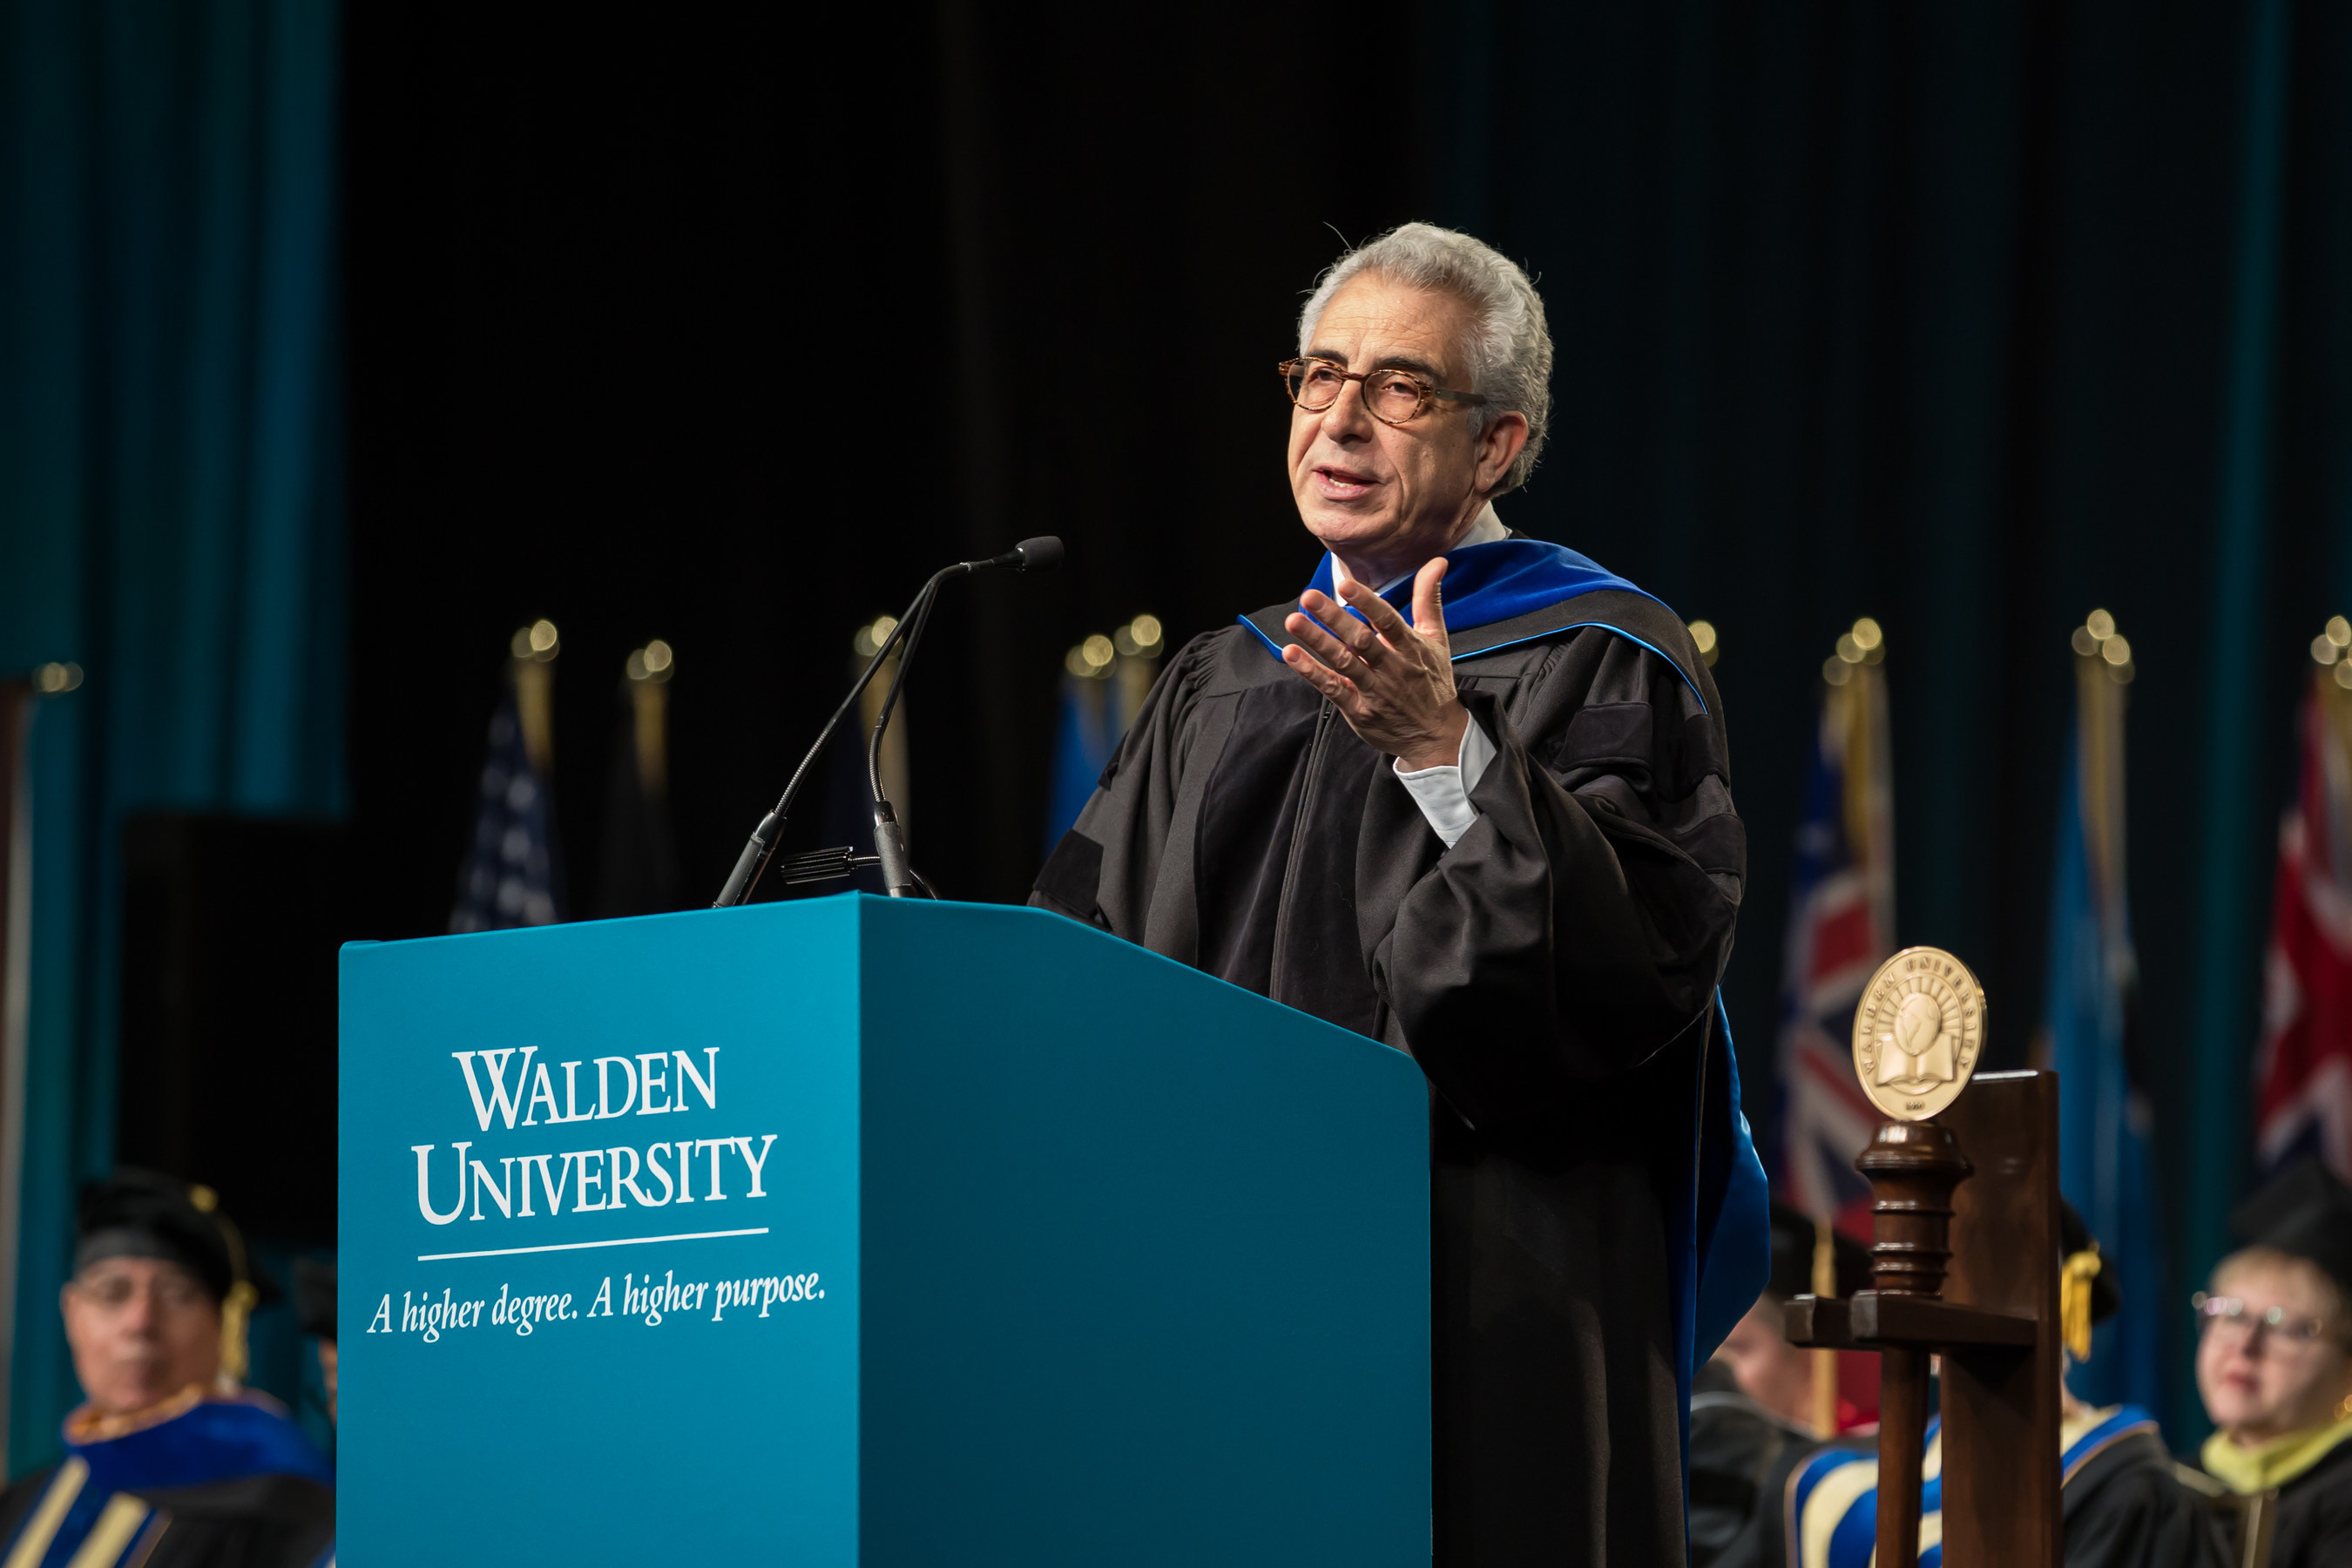 Dr. Ernesto Zedillo, former president of Mexico and Walden University commencement keynote speaker, addresses newest Walden graduates.